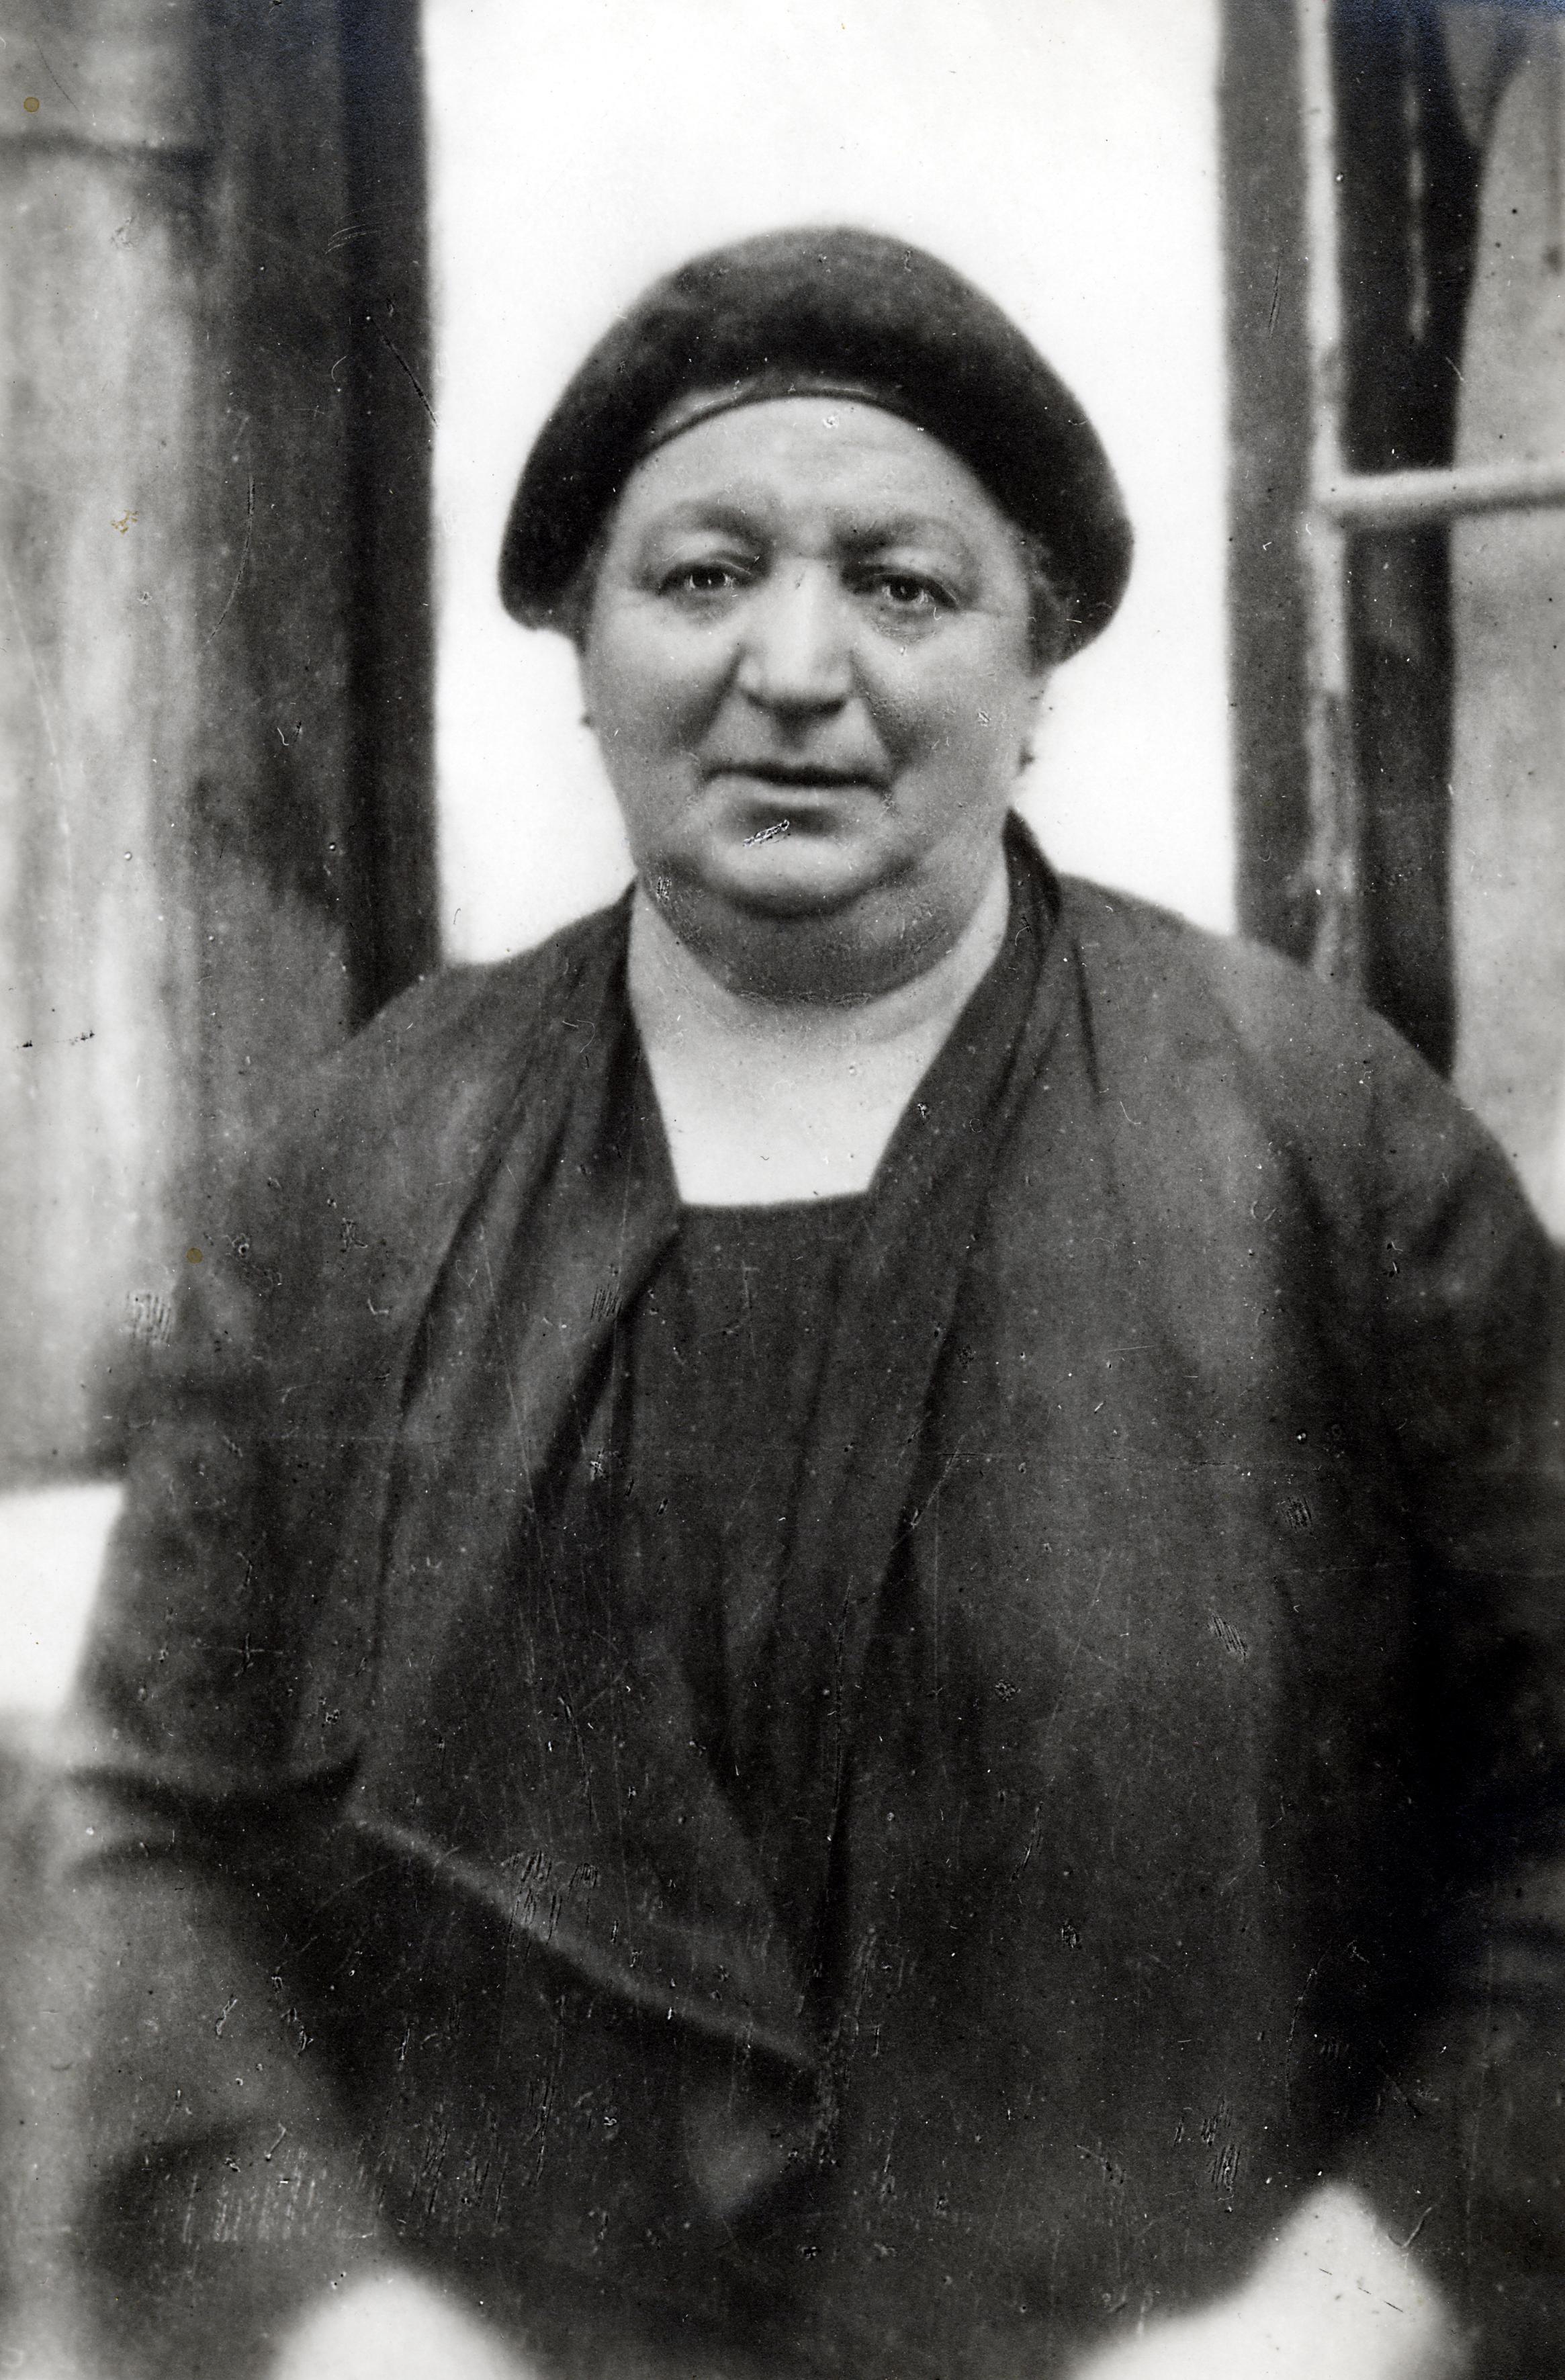 Lilli Tauber's step-grandmother Anna Schischa